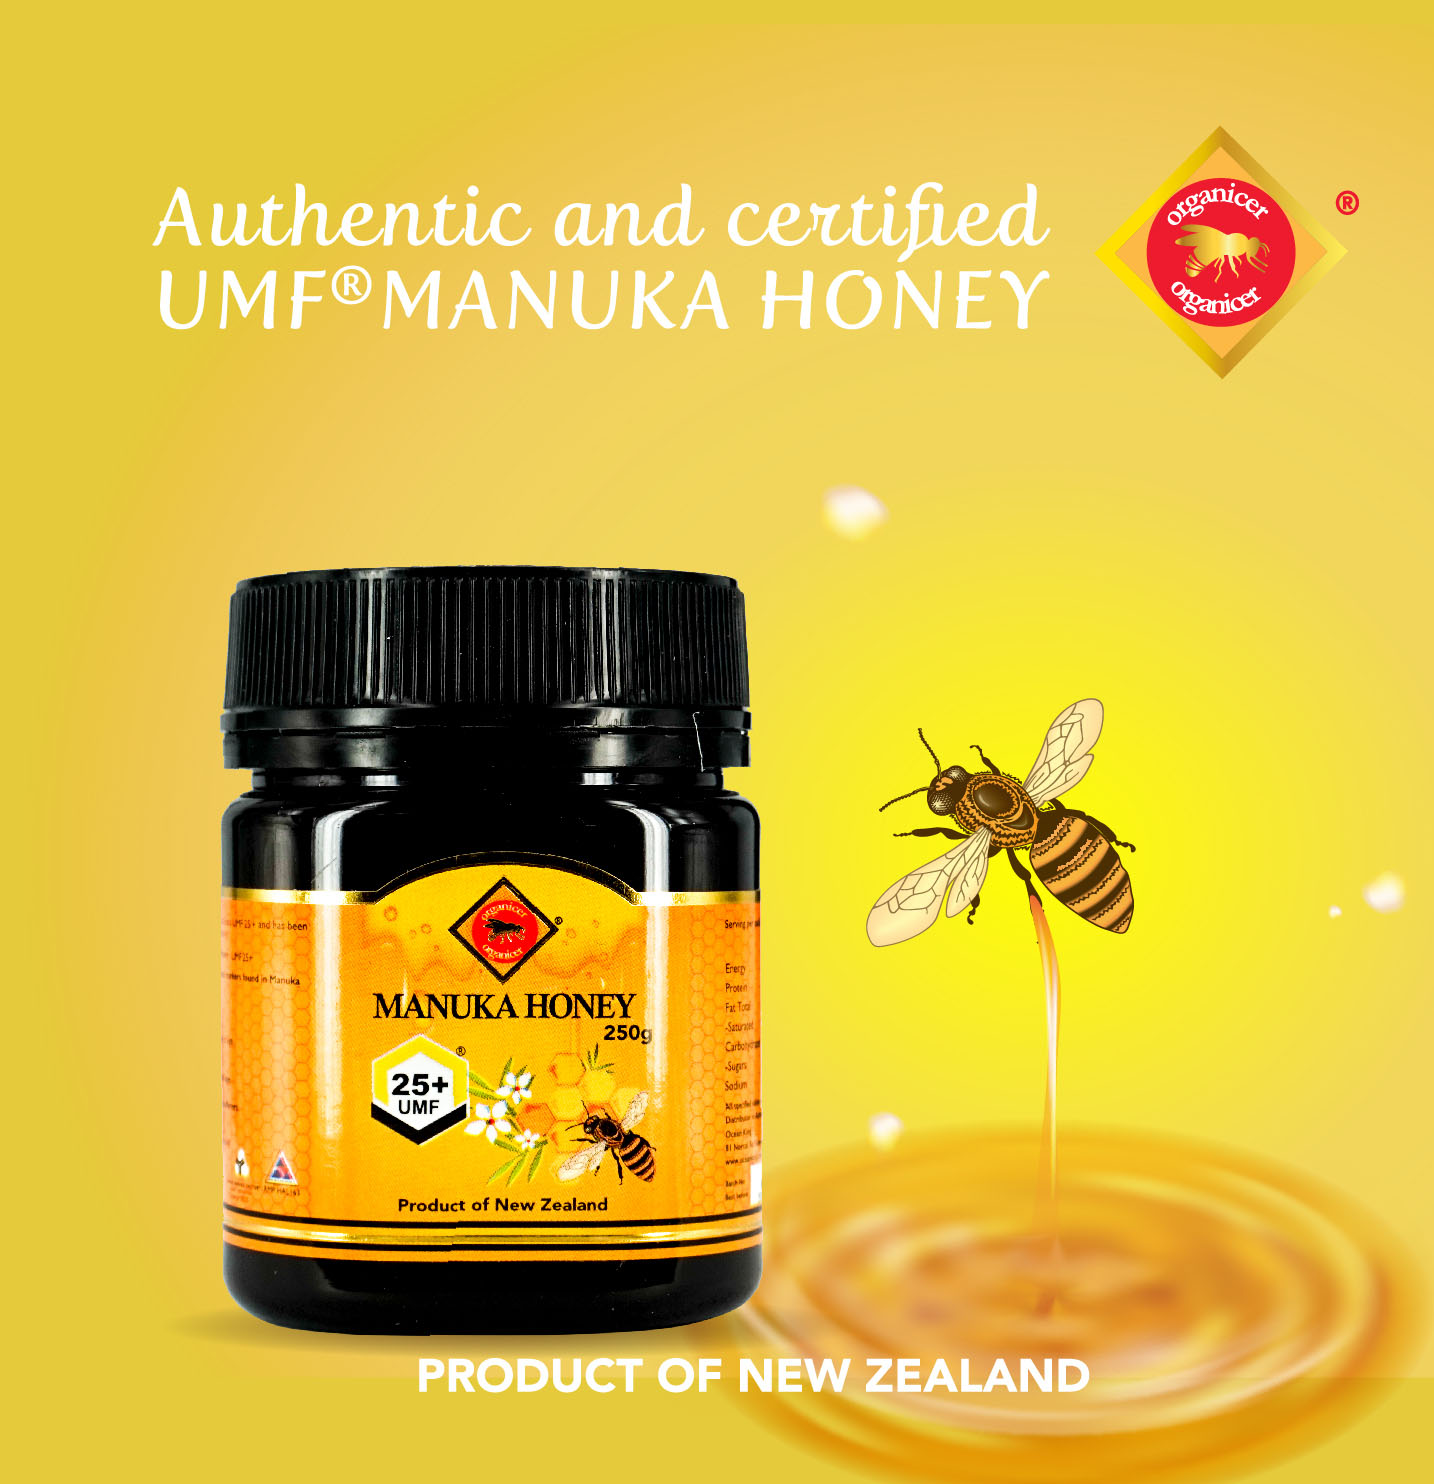 authentic-and-certified-umf-manuka-honey